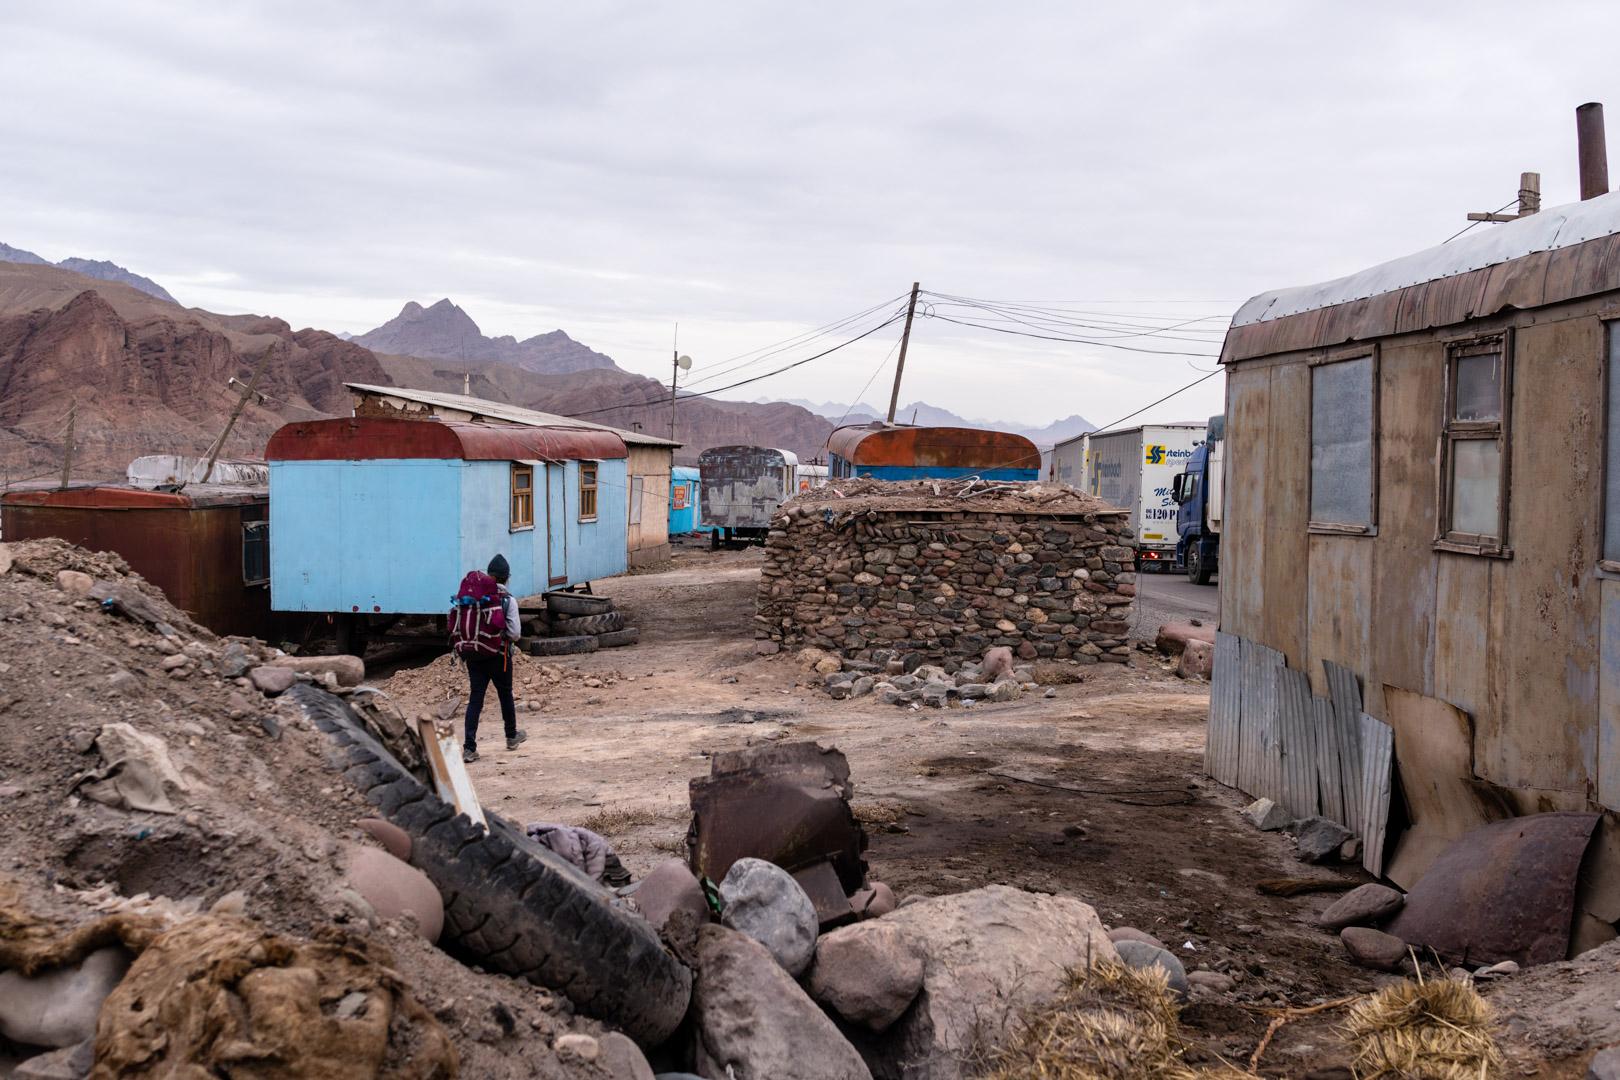 SerialHikers stop autostop world monde tour hitchhiking aventure adventure alternative travel voyage sans avion no fly Kyrghyzstan Kirgizstan border china frontière chine voyager minimaliste